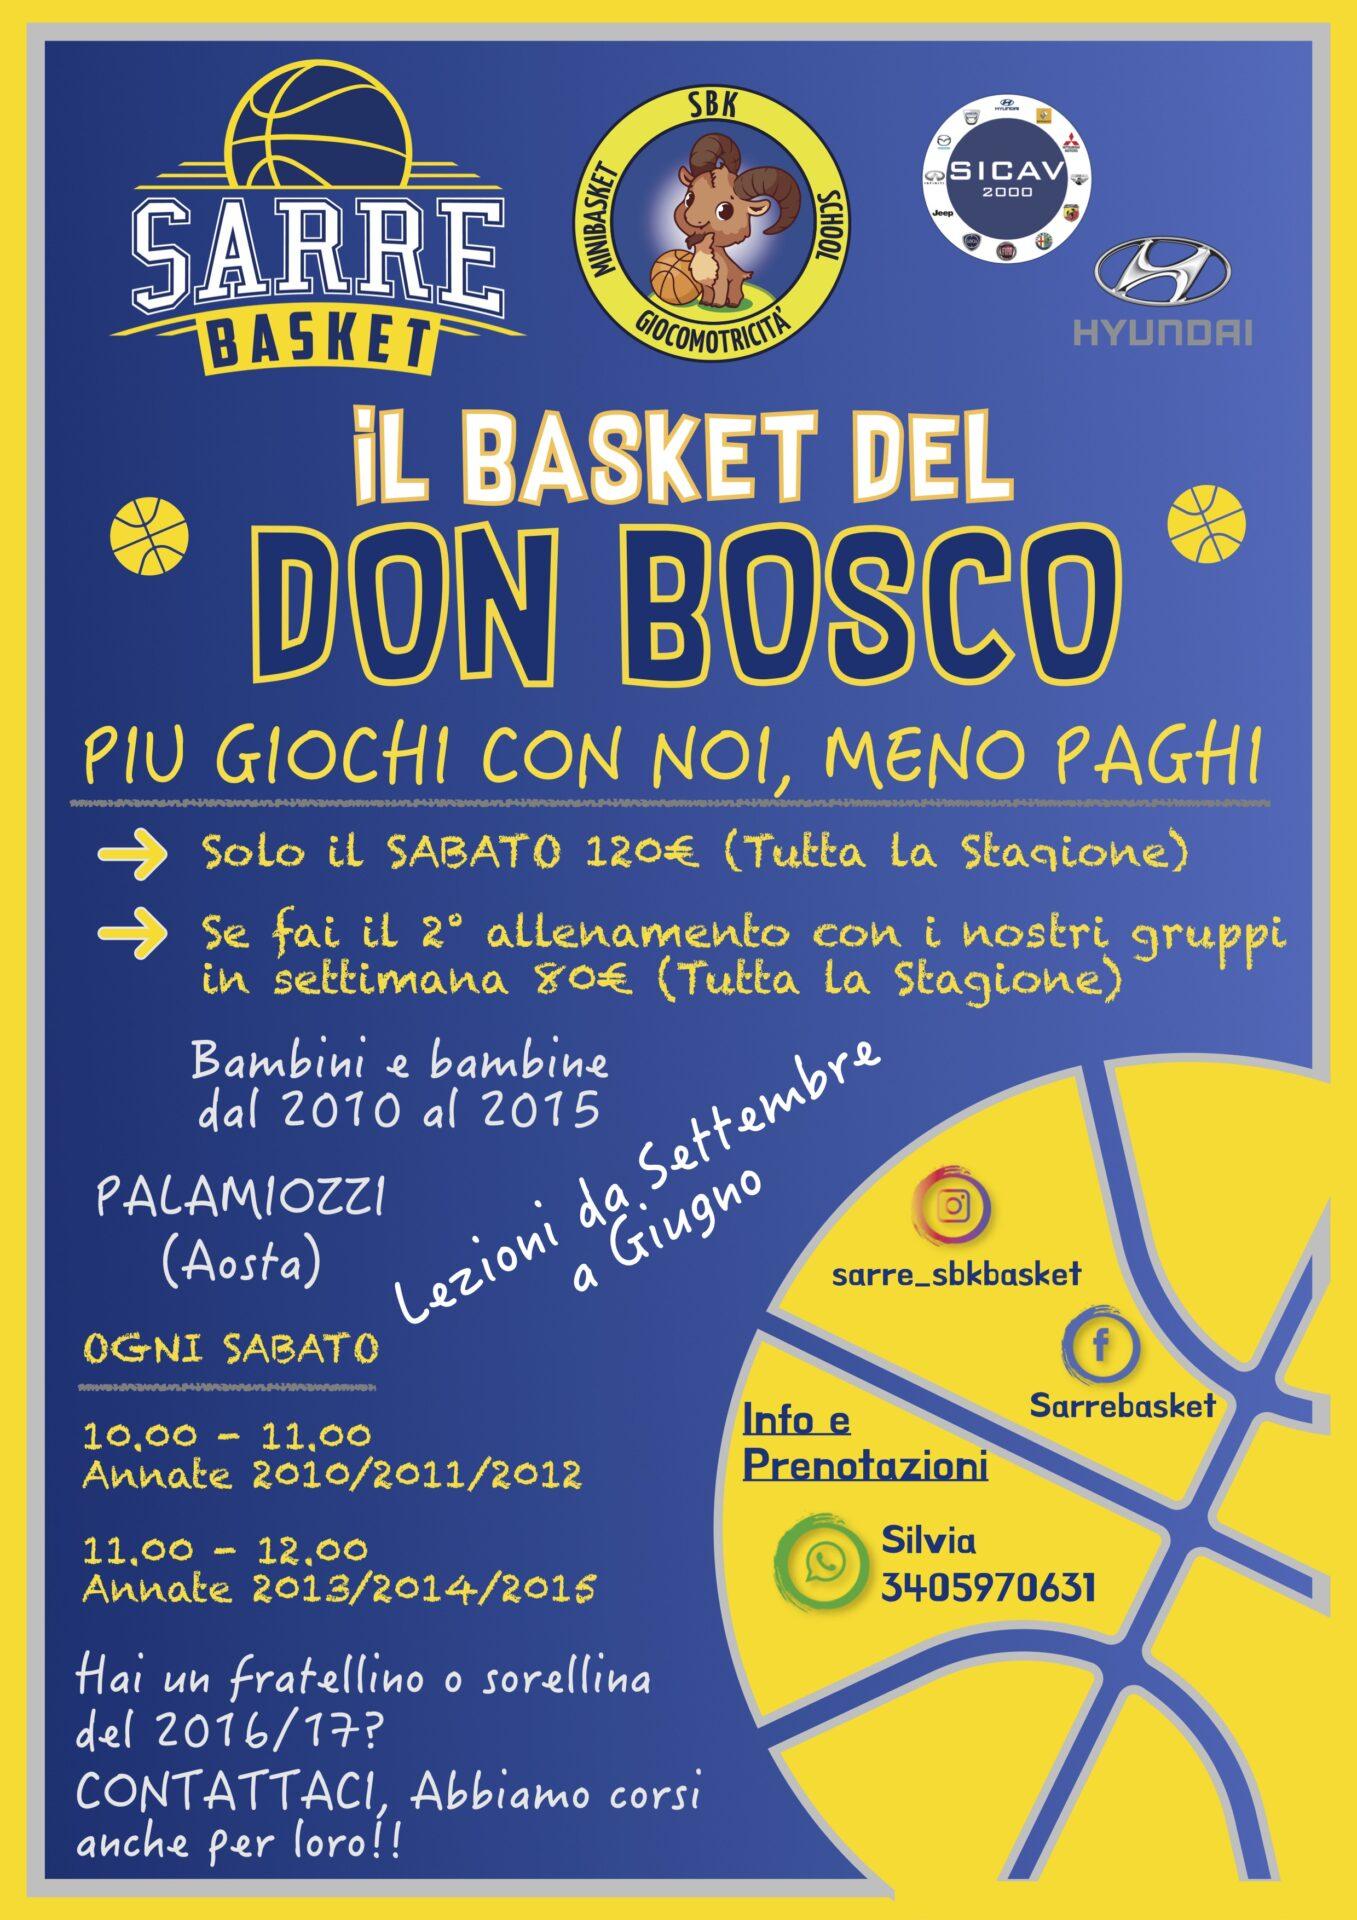 Il Basket del DONBOSCO